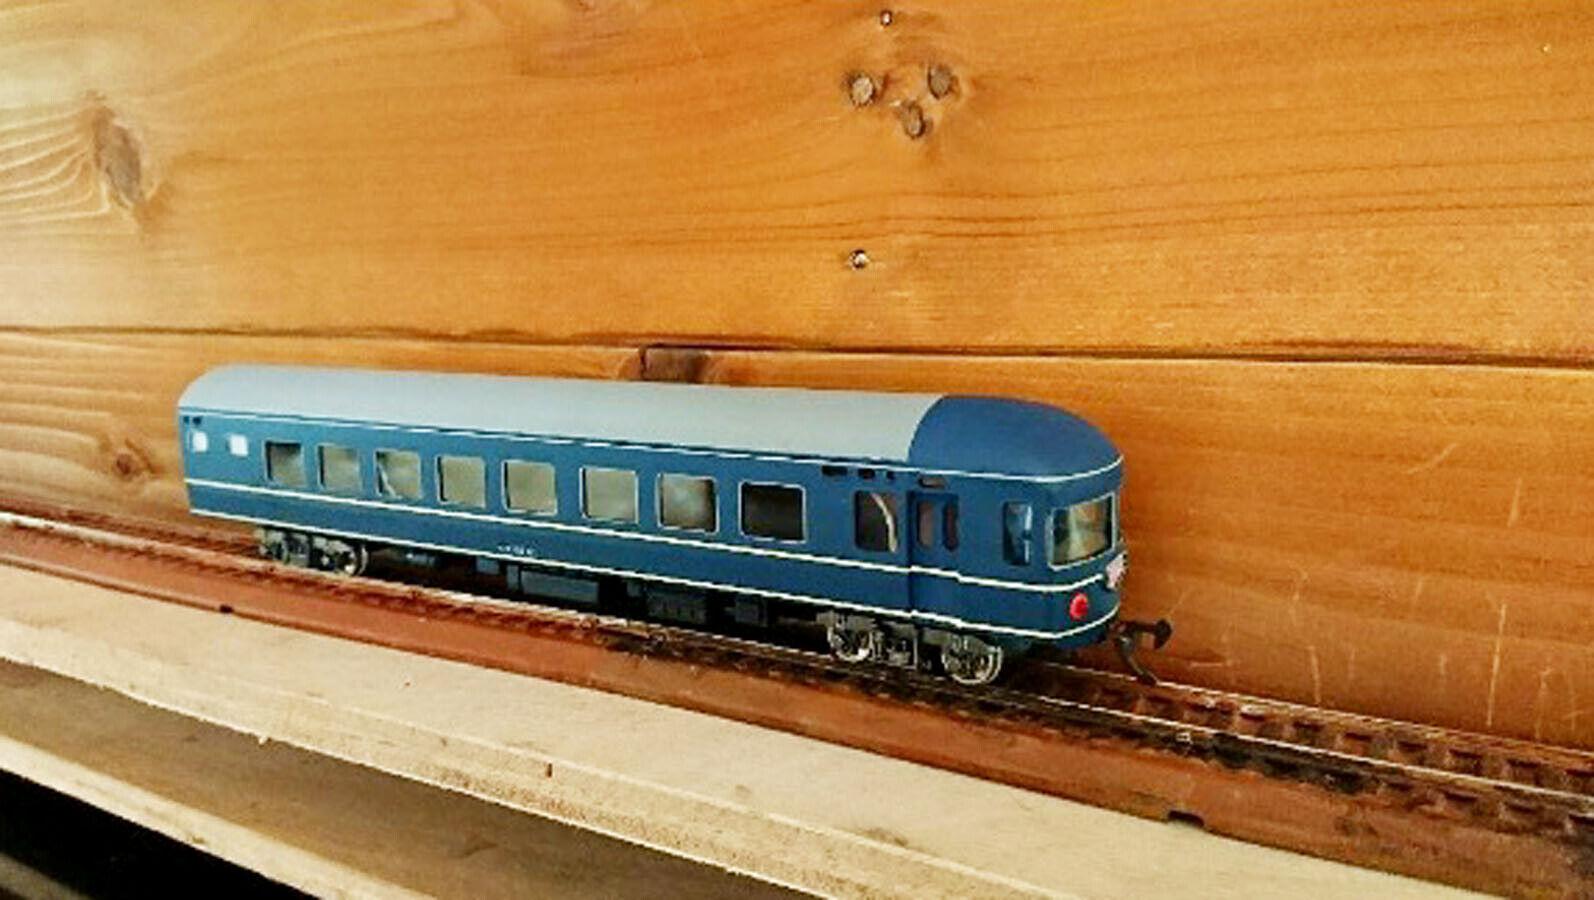 Katsumi HO Nahanefu 22 Passenger Train with box Vintage Toy F S